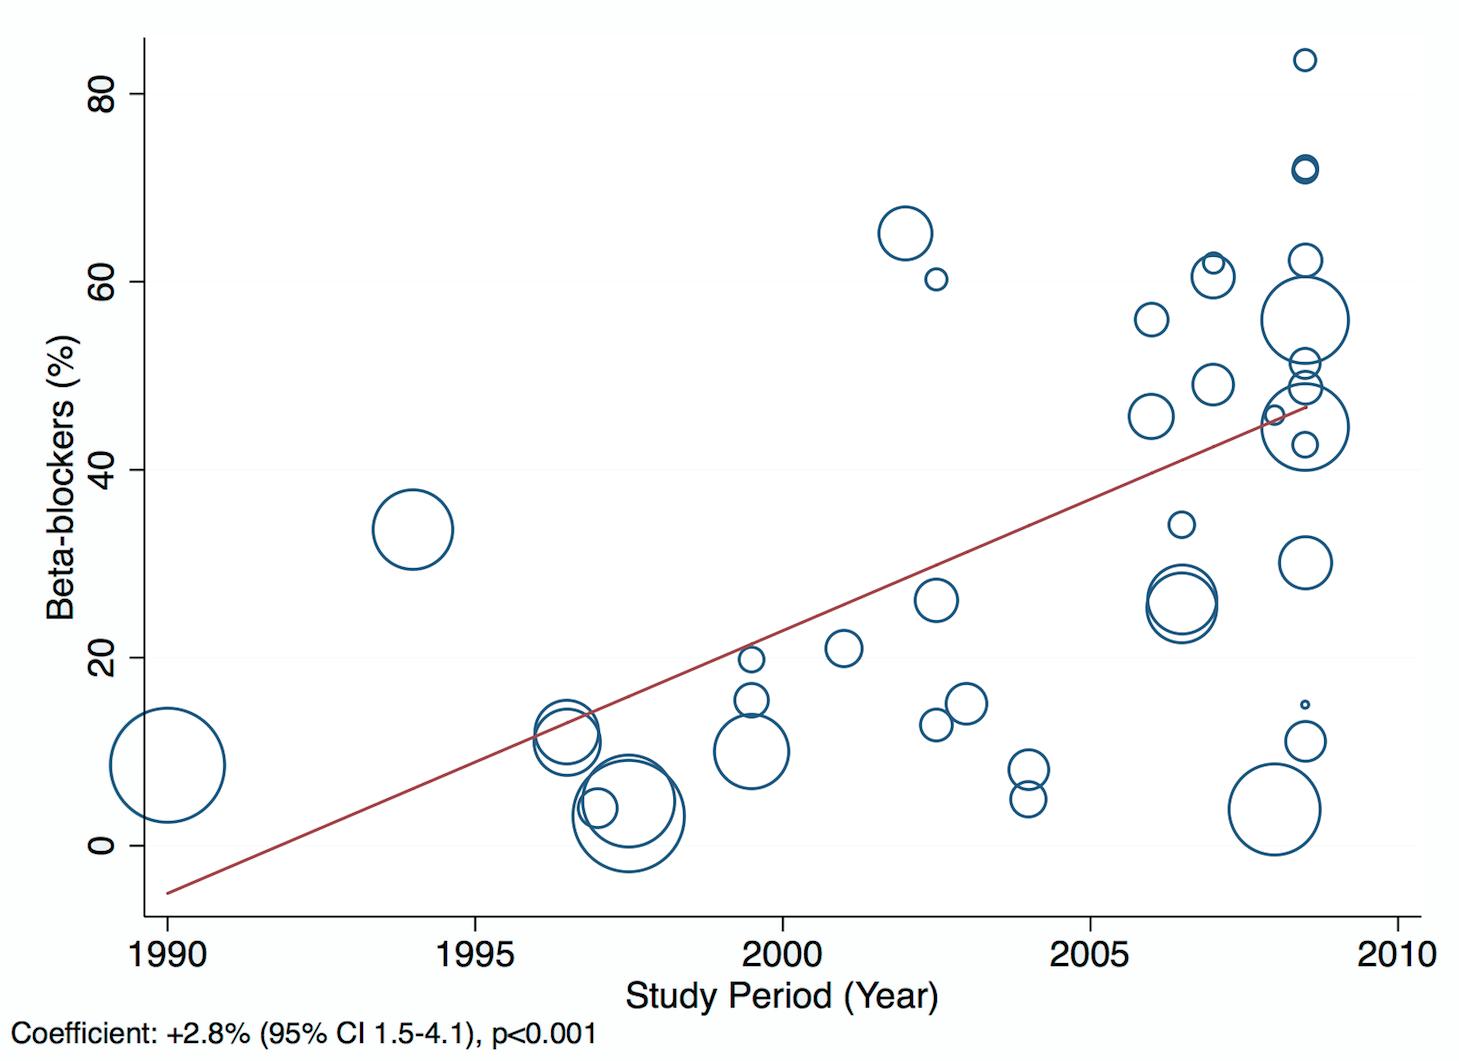 Meta-regression of beta-blocker use against study period.